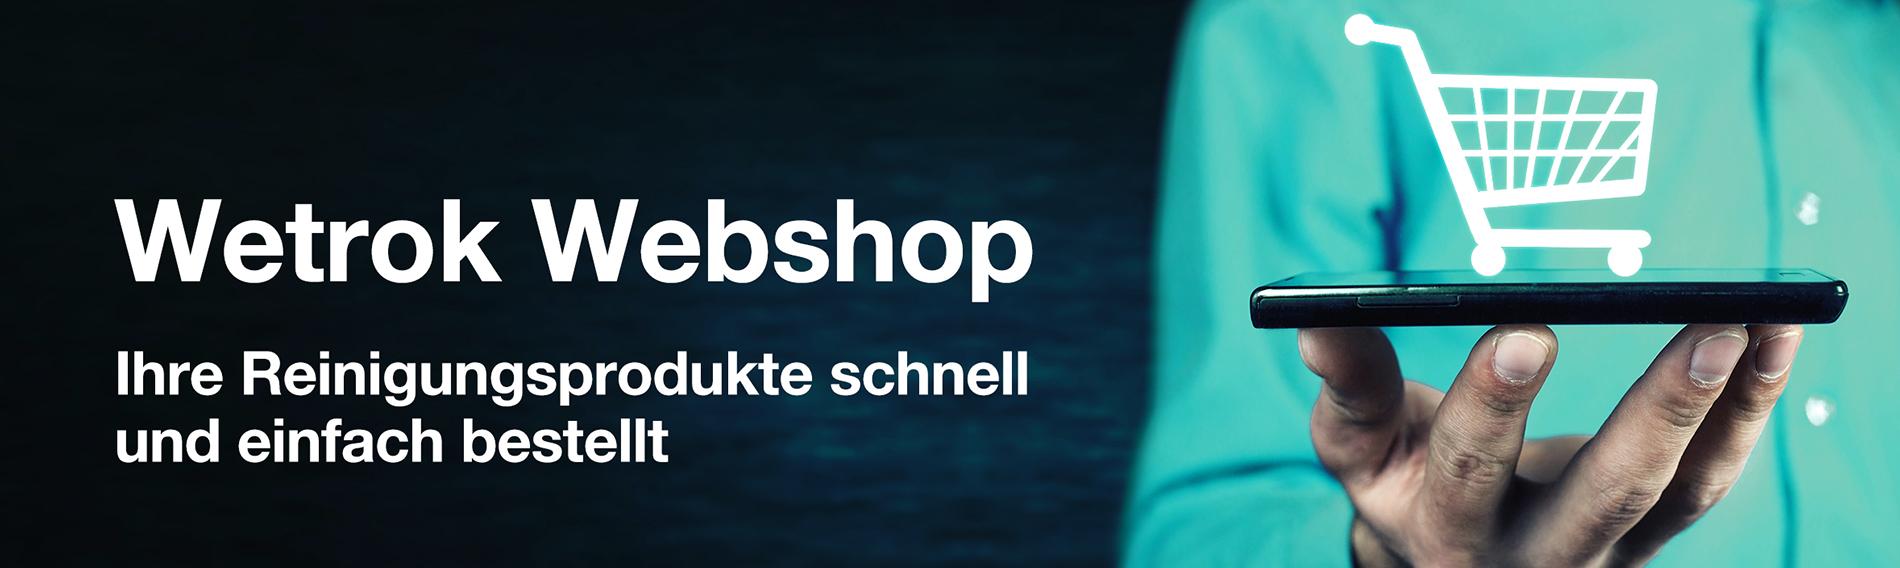 Neuer Wetrok Webshop